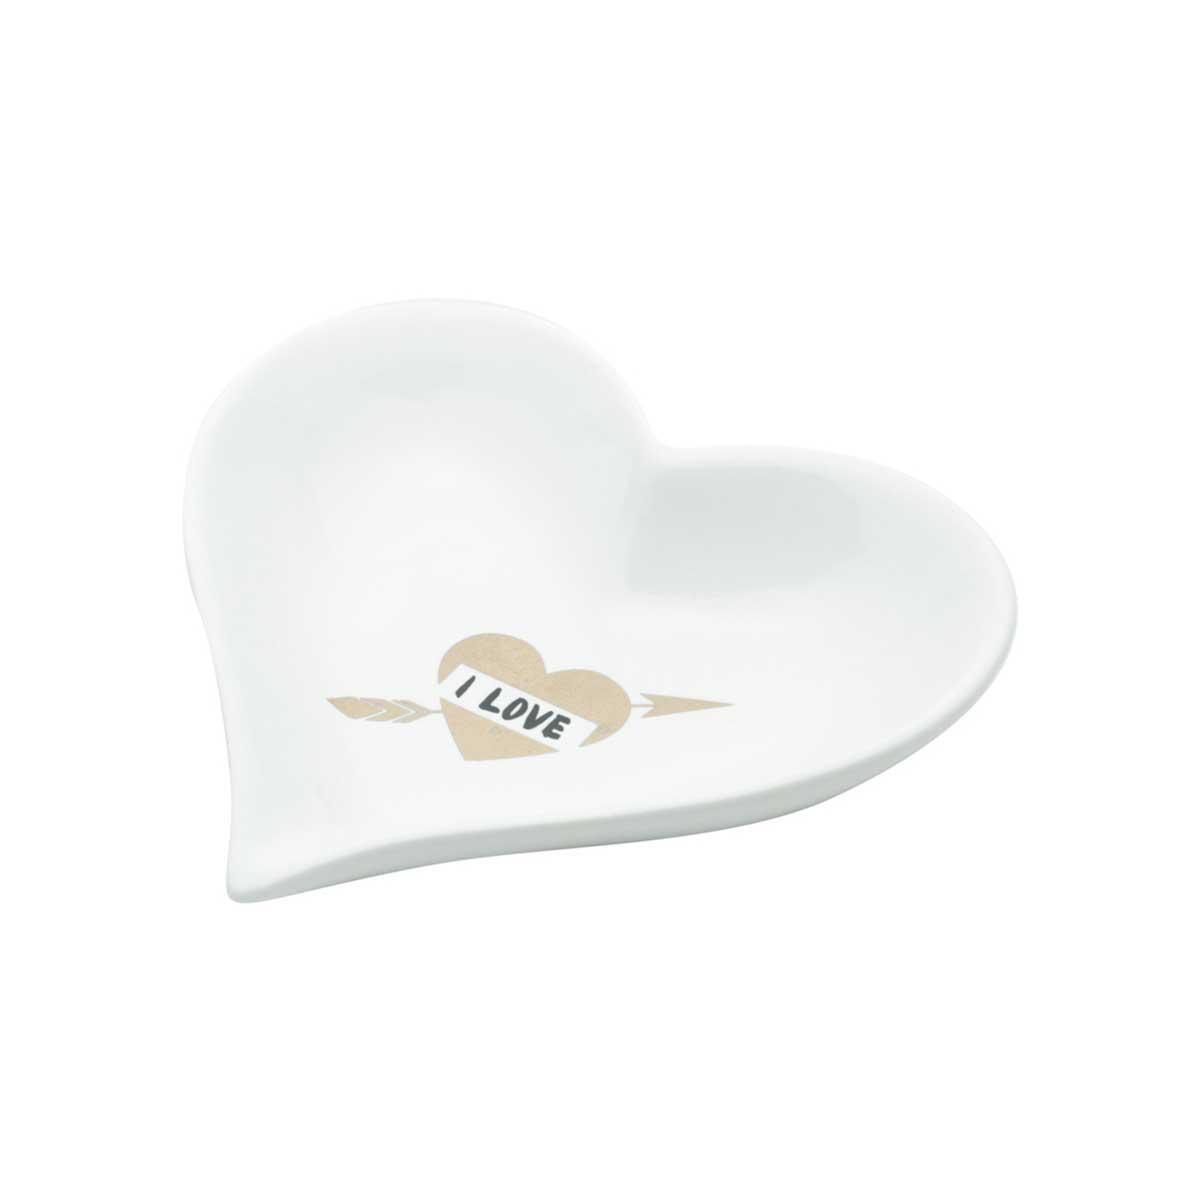 Mini Prato Decorativo Porta Anéis e Acessórios Heart Love